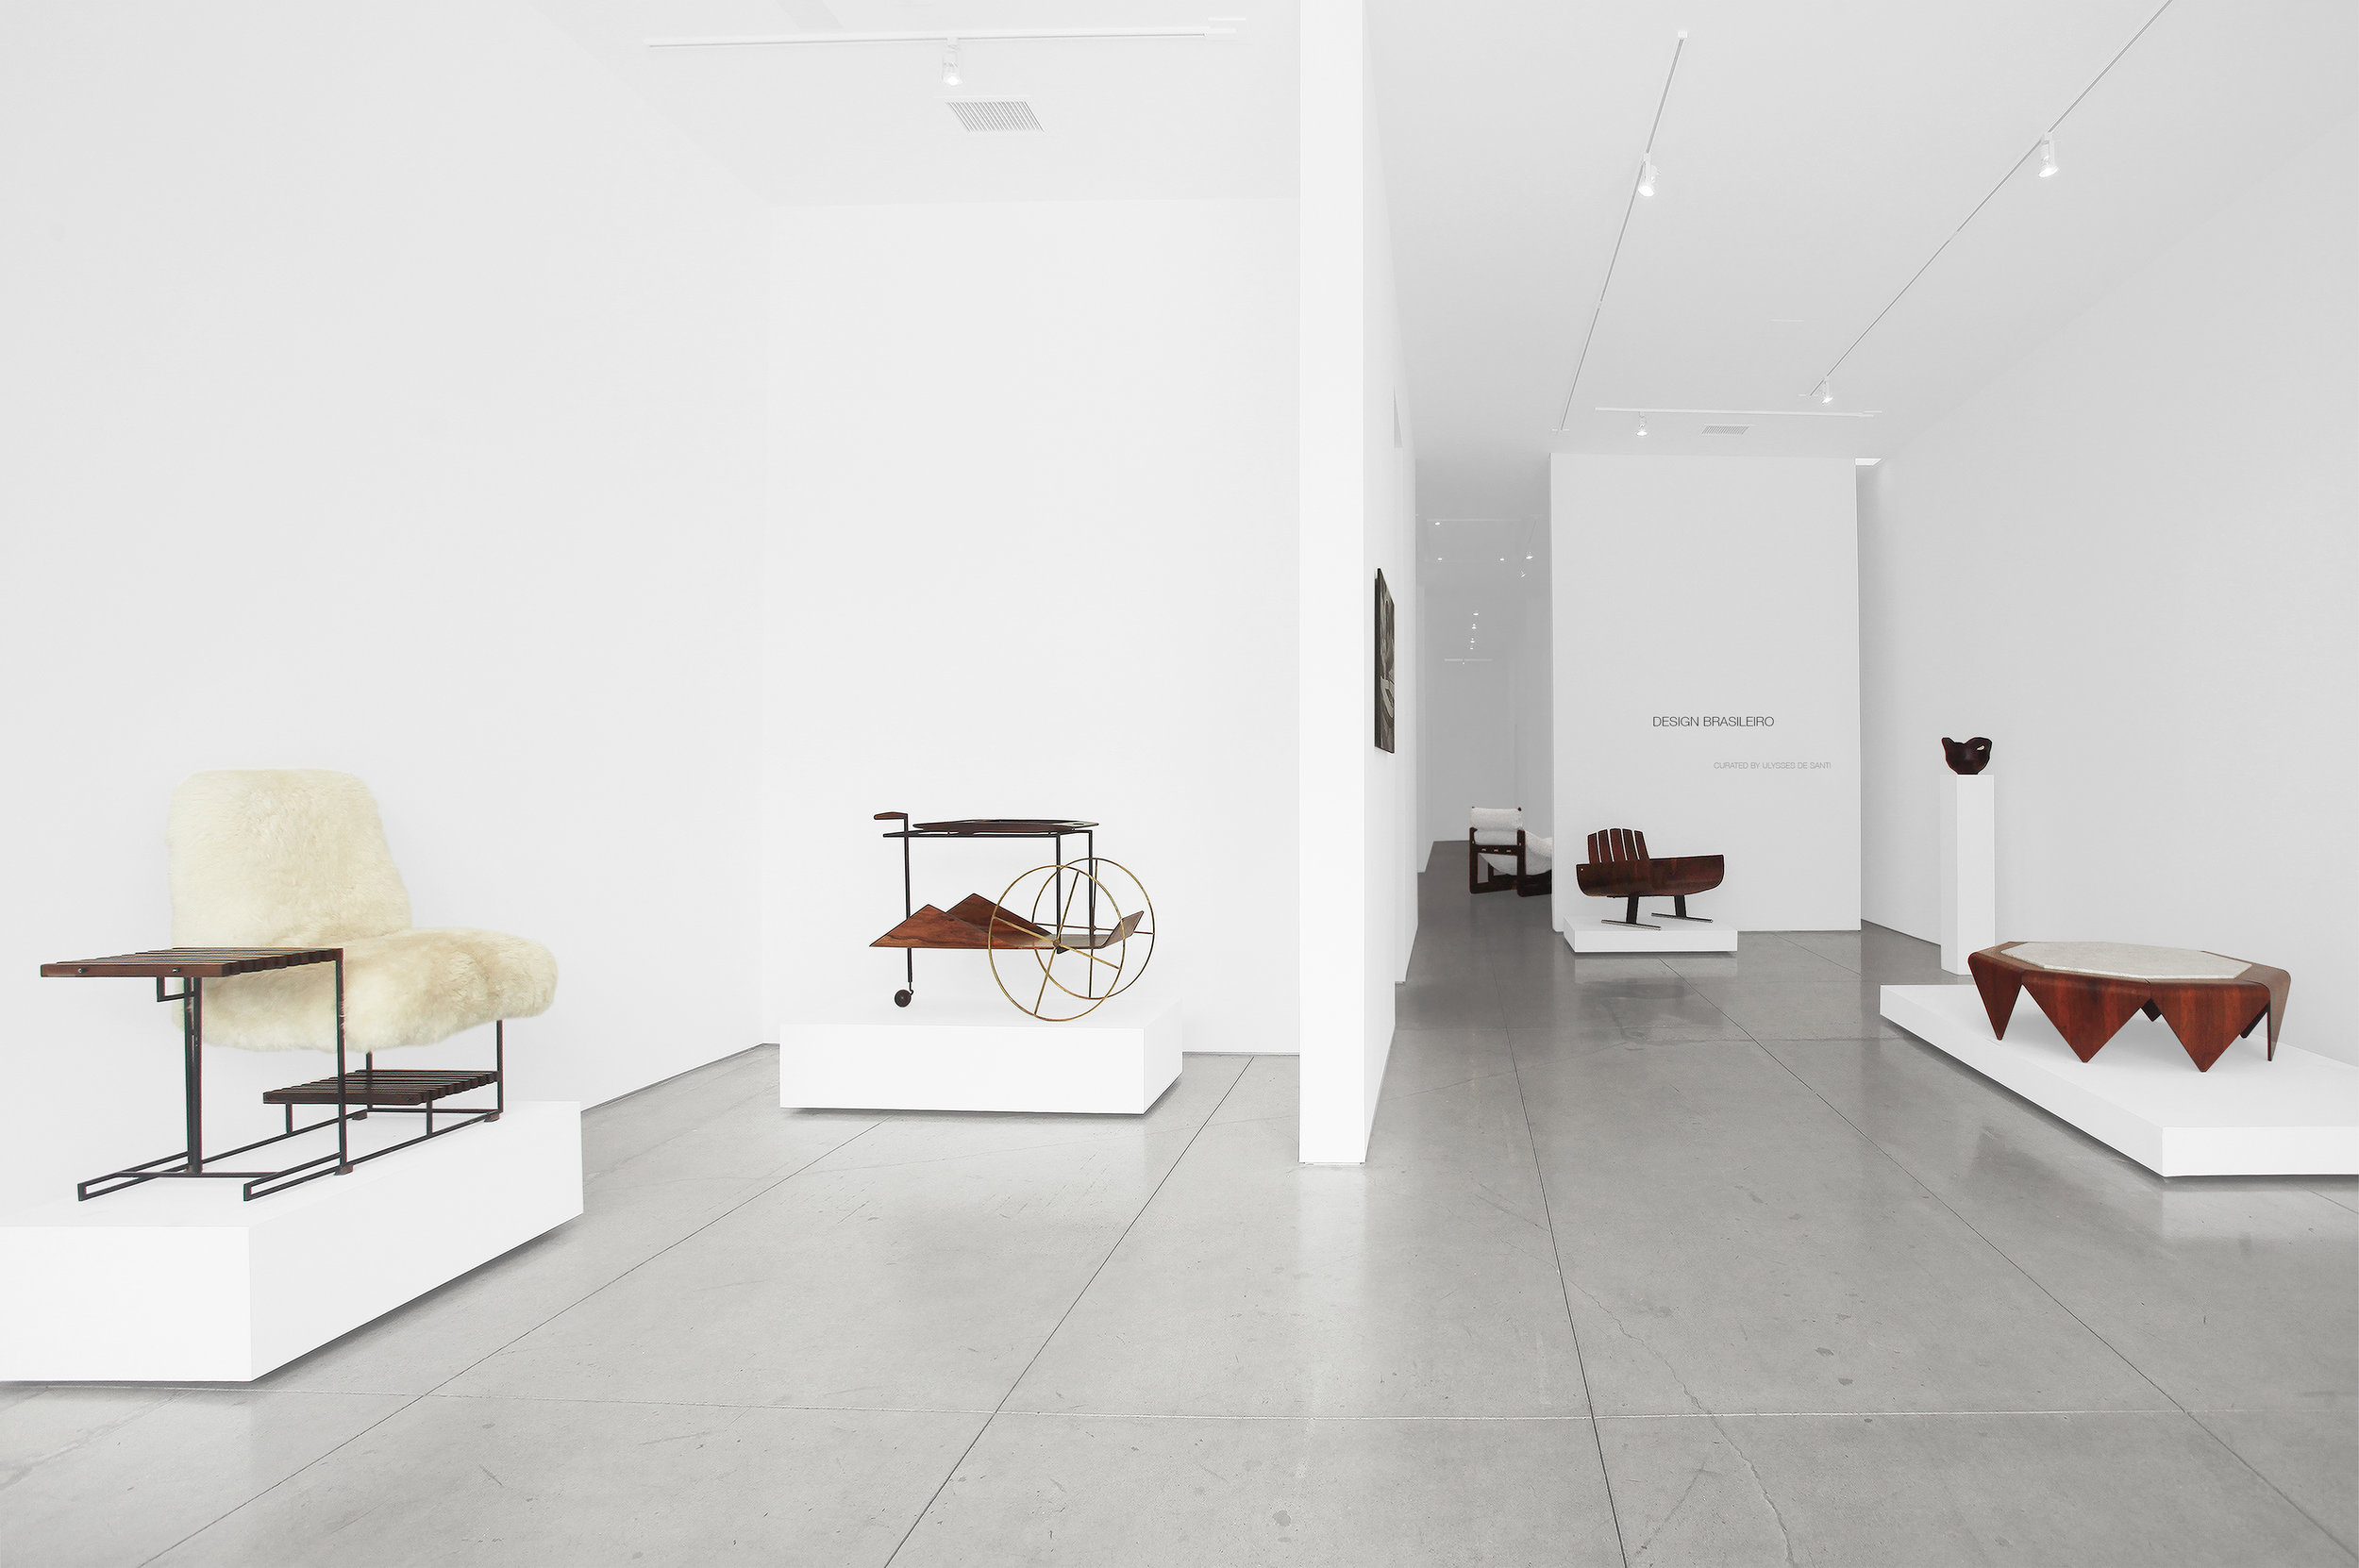 Design Brasileiro, Curated by Ulysses de Santi, Peter Blake Gallery, 2018, Installation View_0.jpg